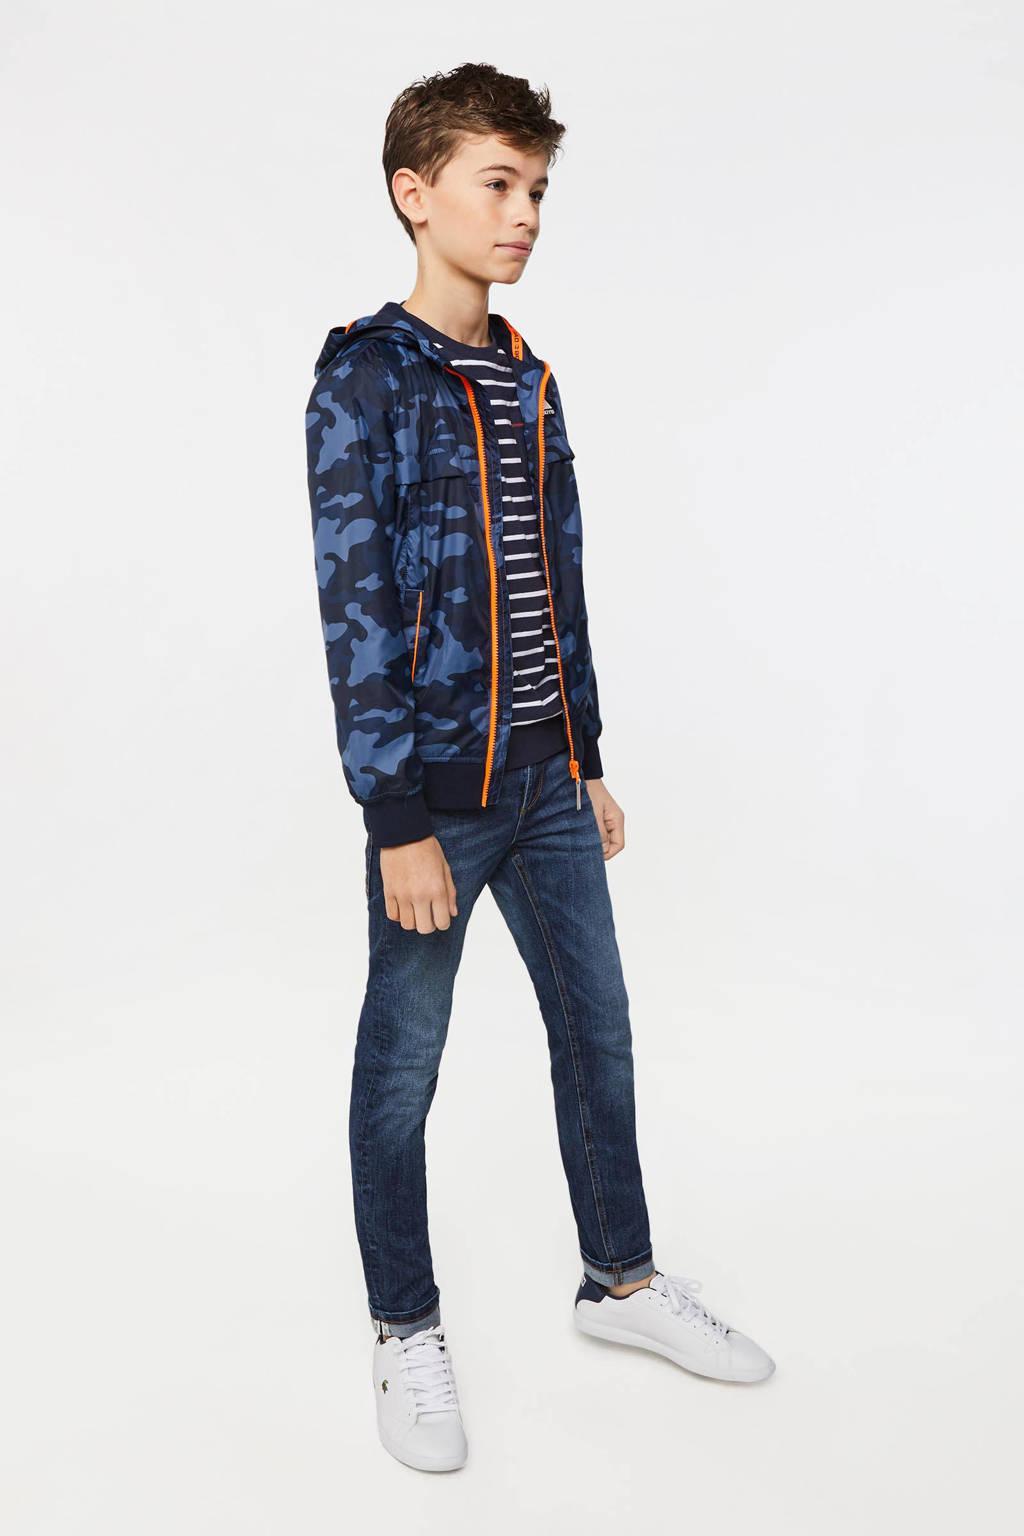 WE Fashion tussenjas met camouflageprint donkerblauw/blauw, Donkerblauw/blauw